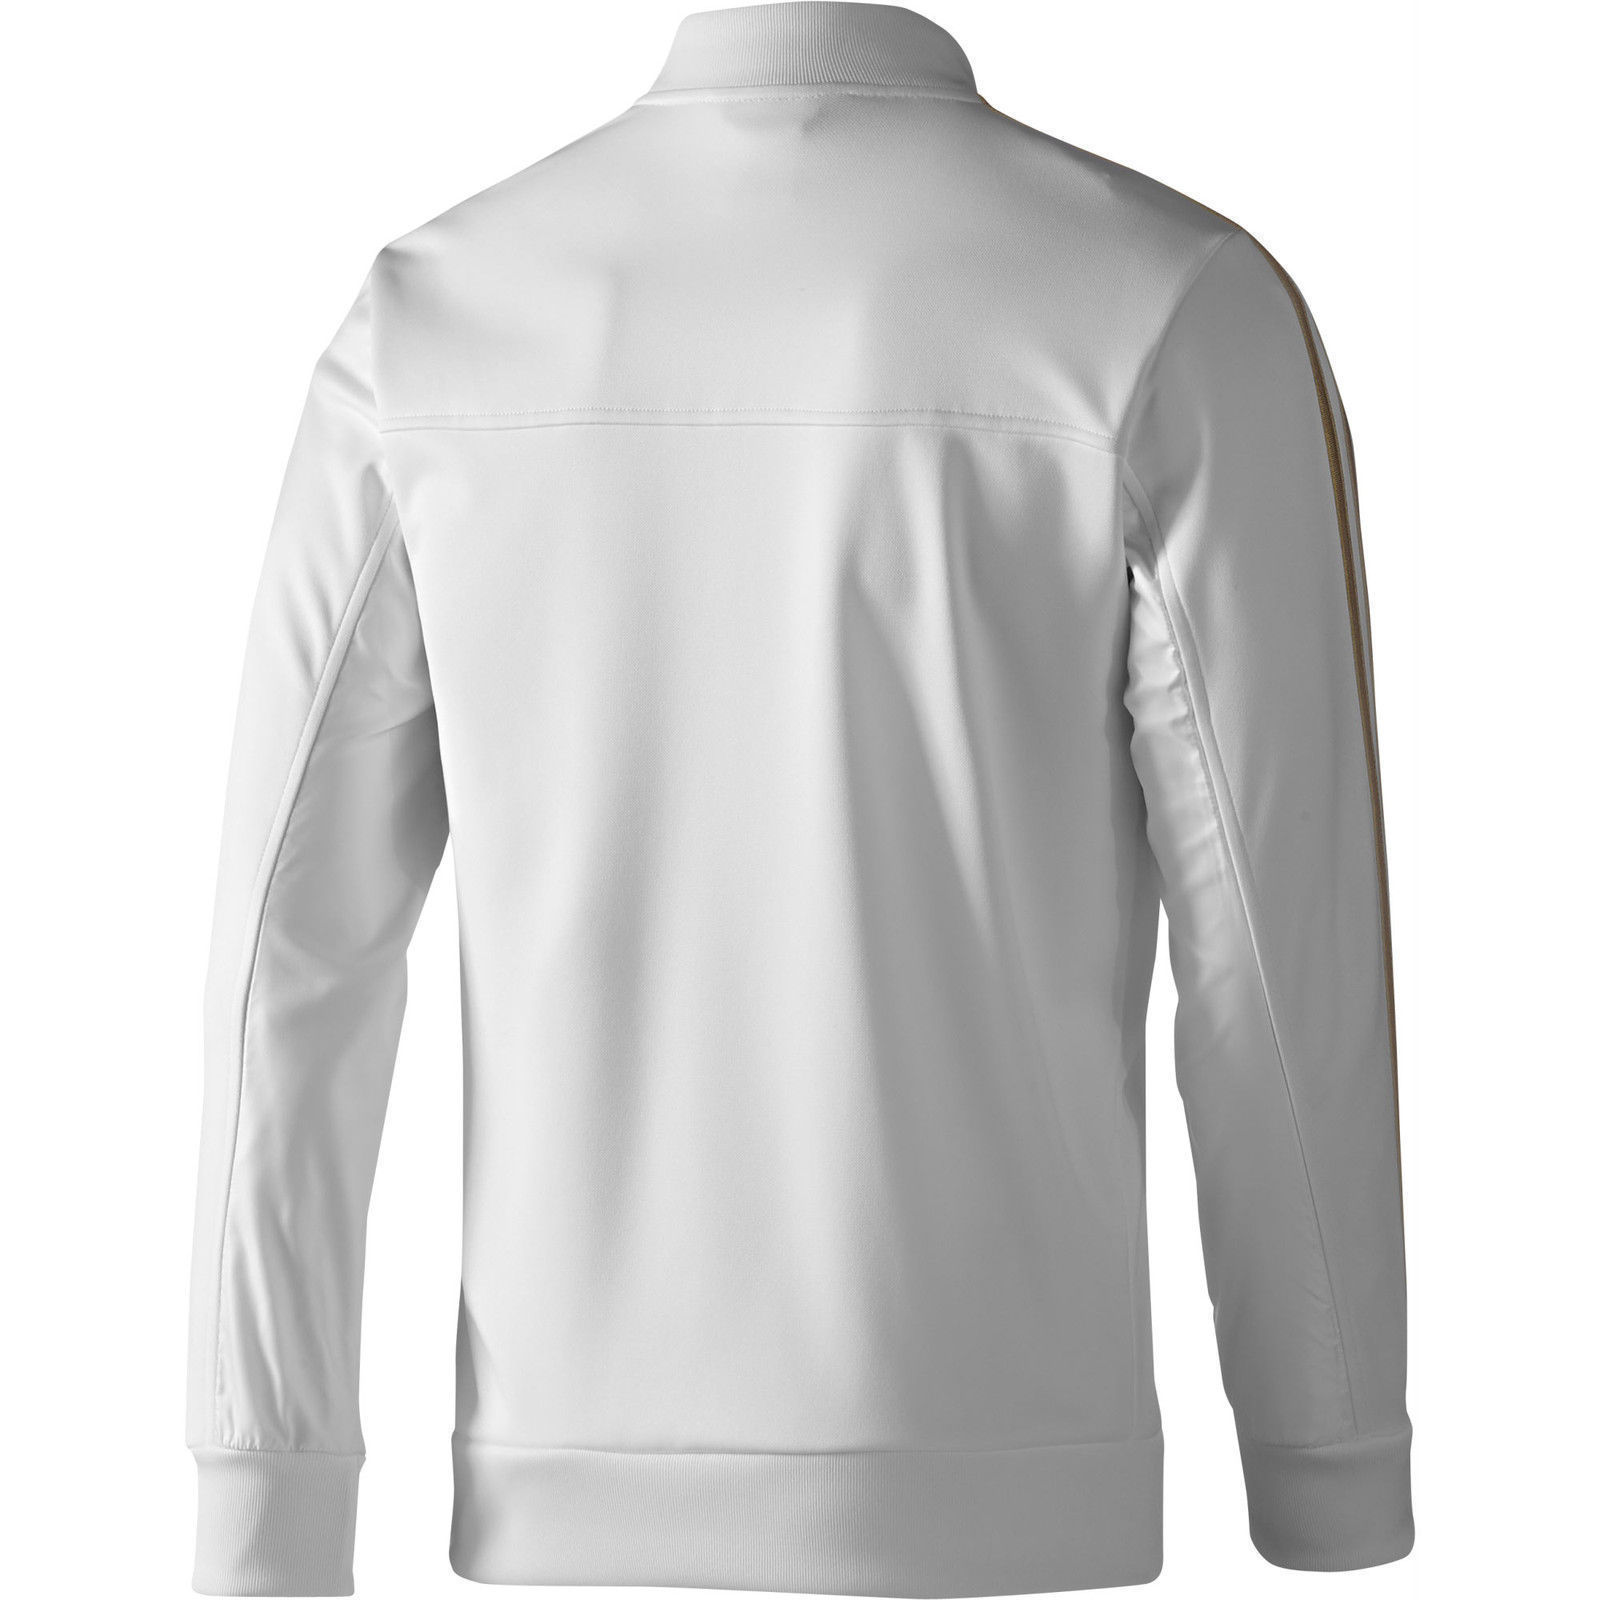 7d1f117715ad Adidas Ac Milan Anthem Jacket. and 50 similar items